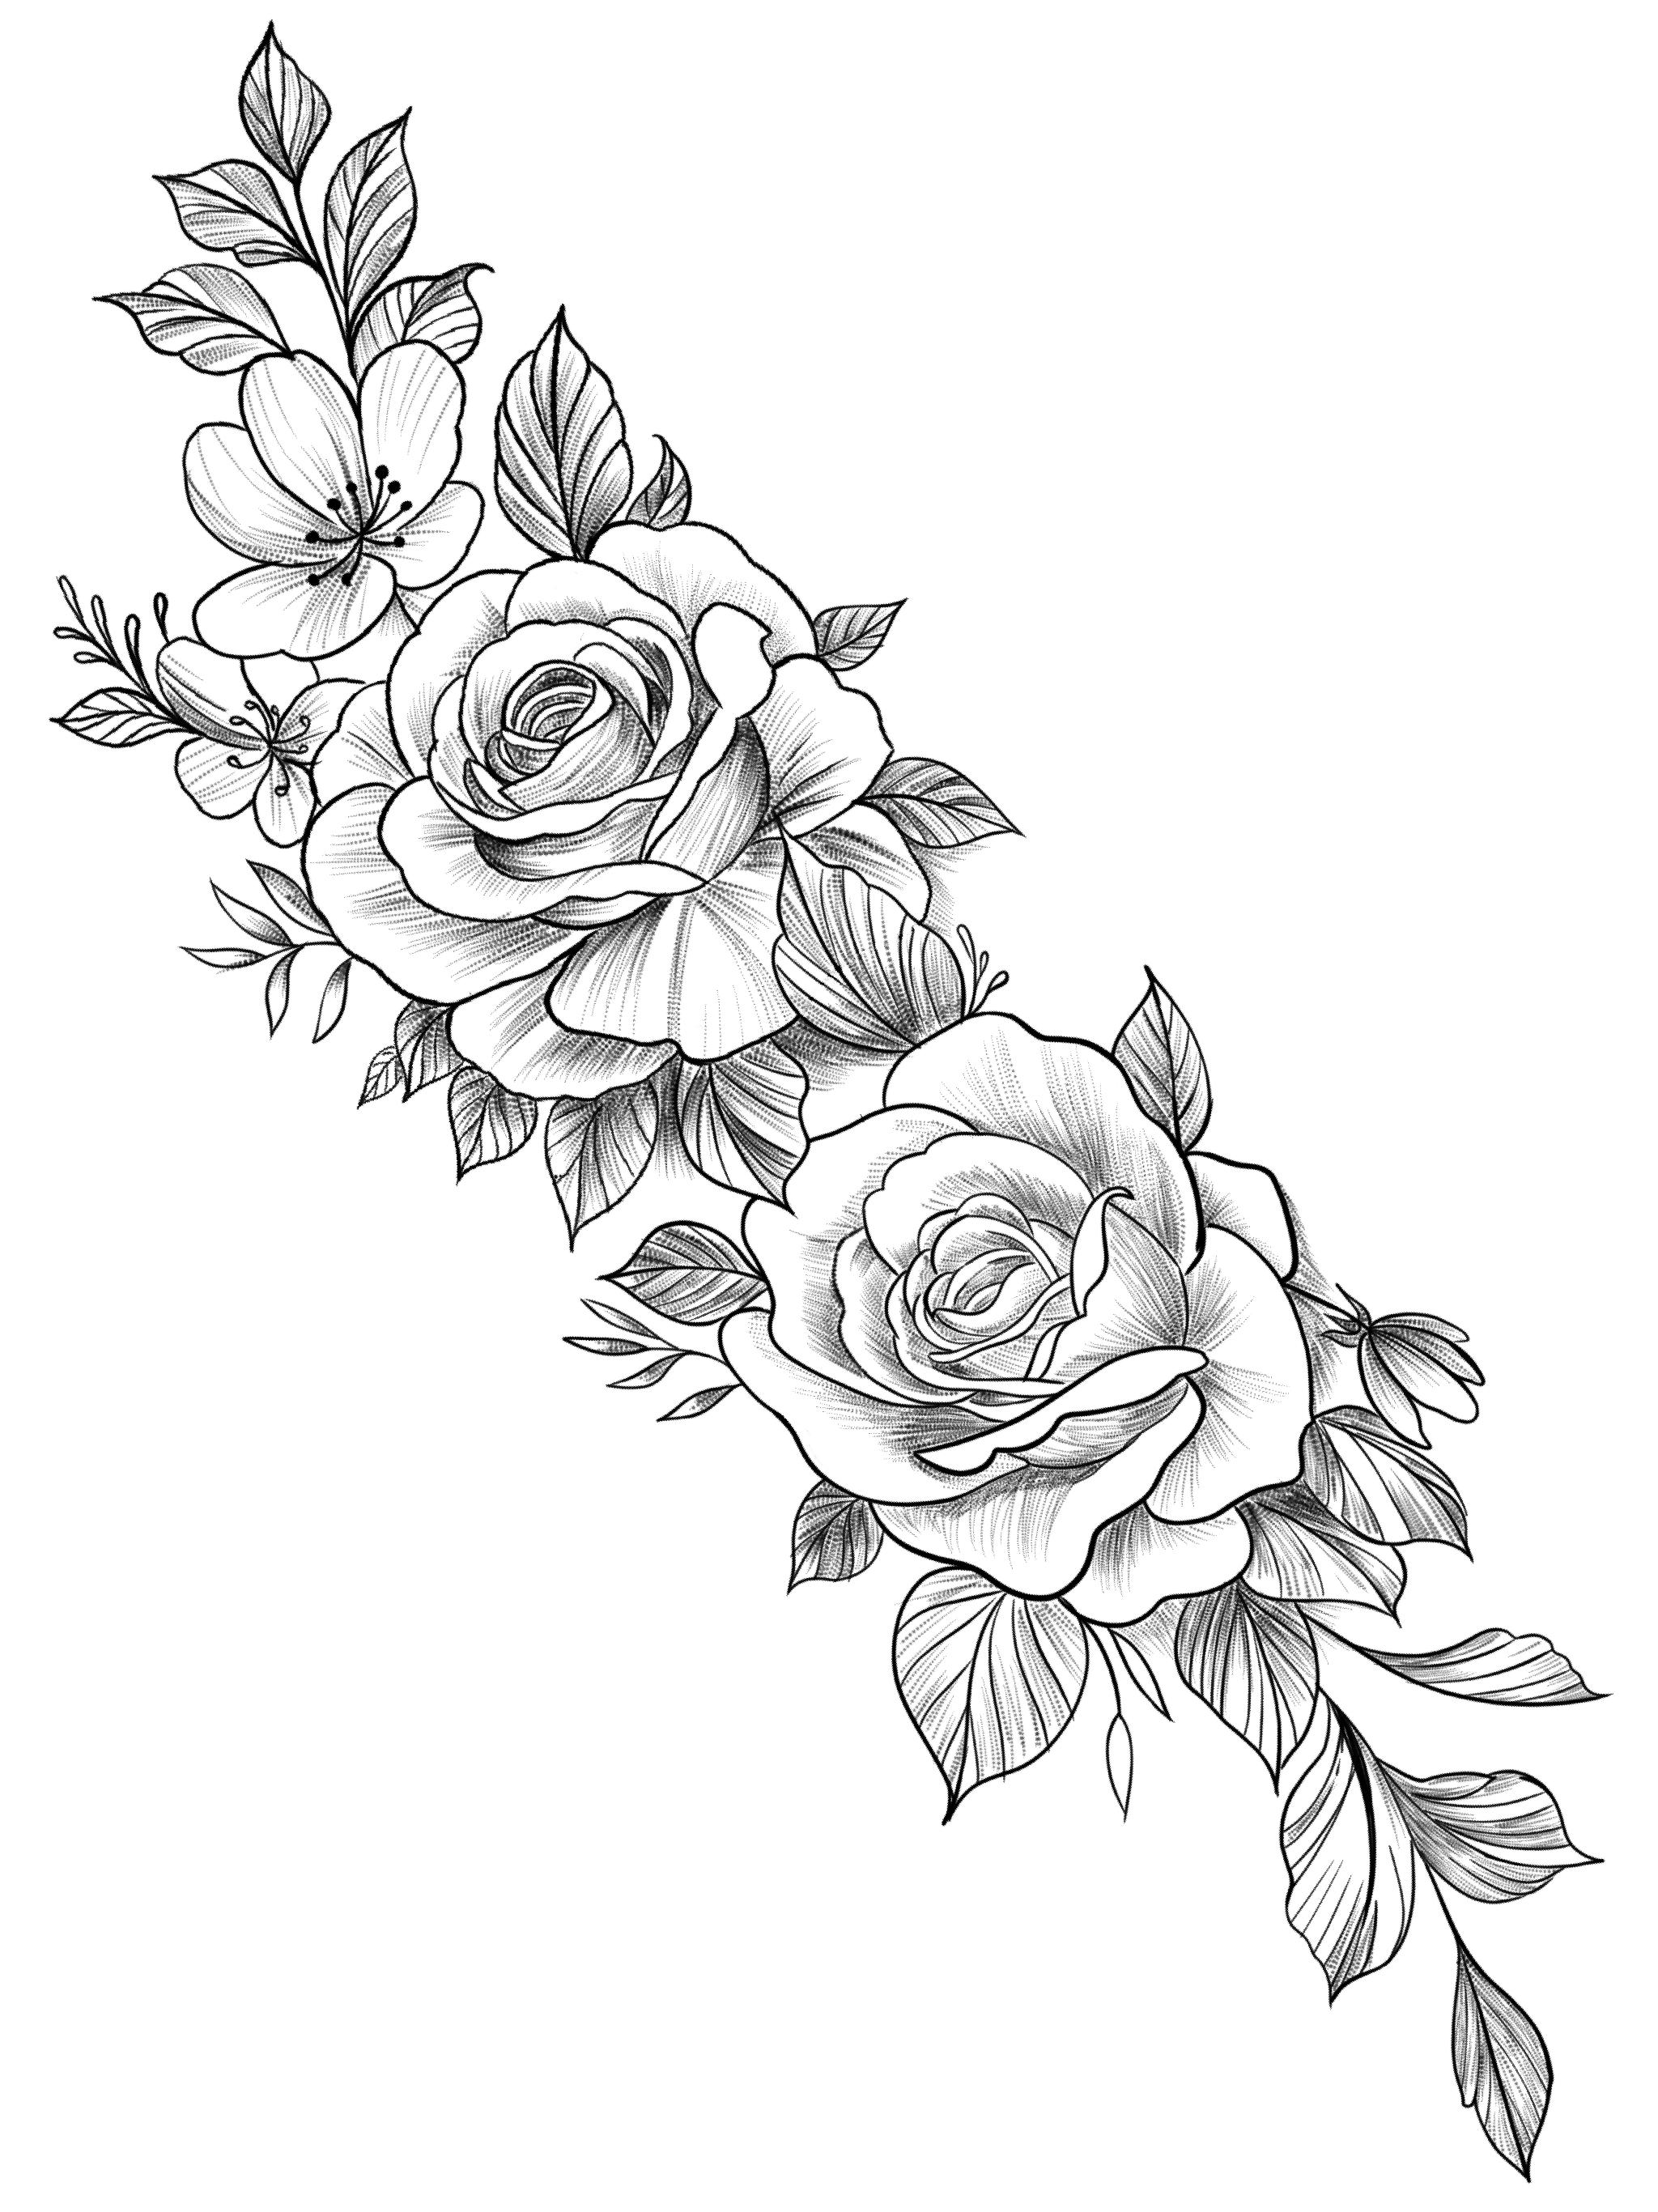 рисунки роз на руке картинки цирковой силач